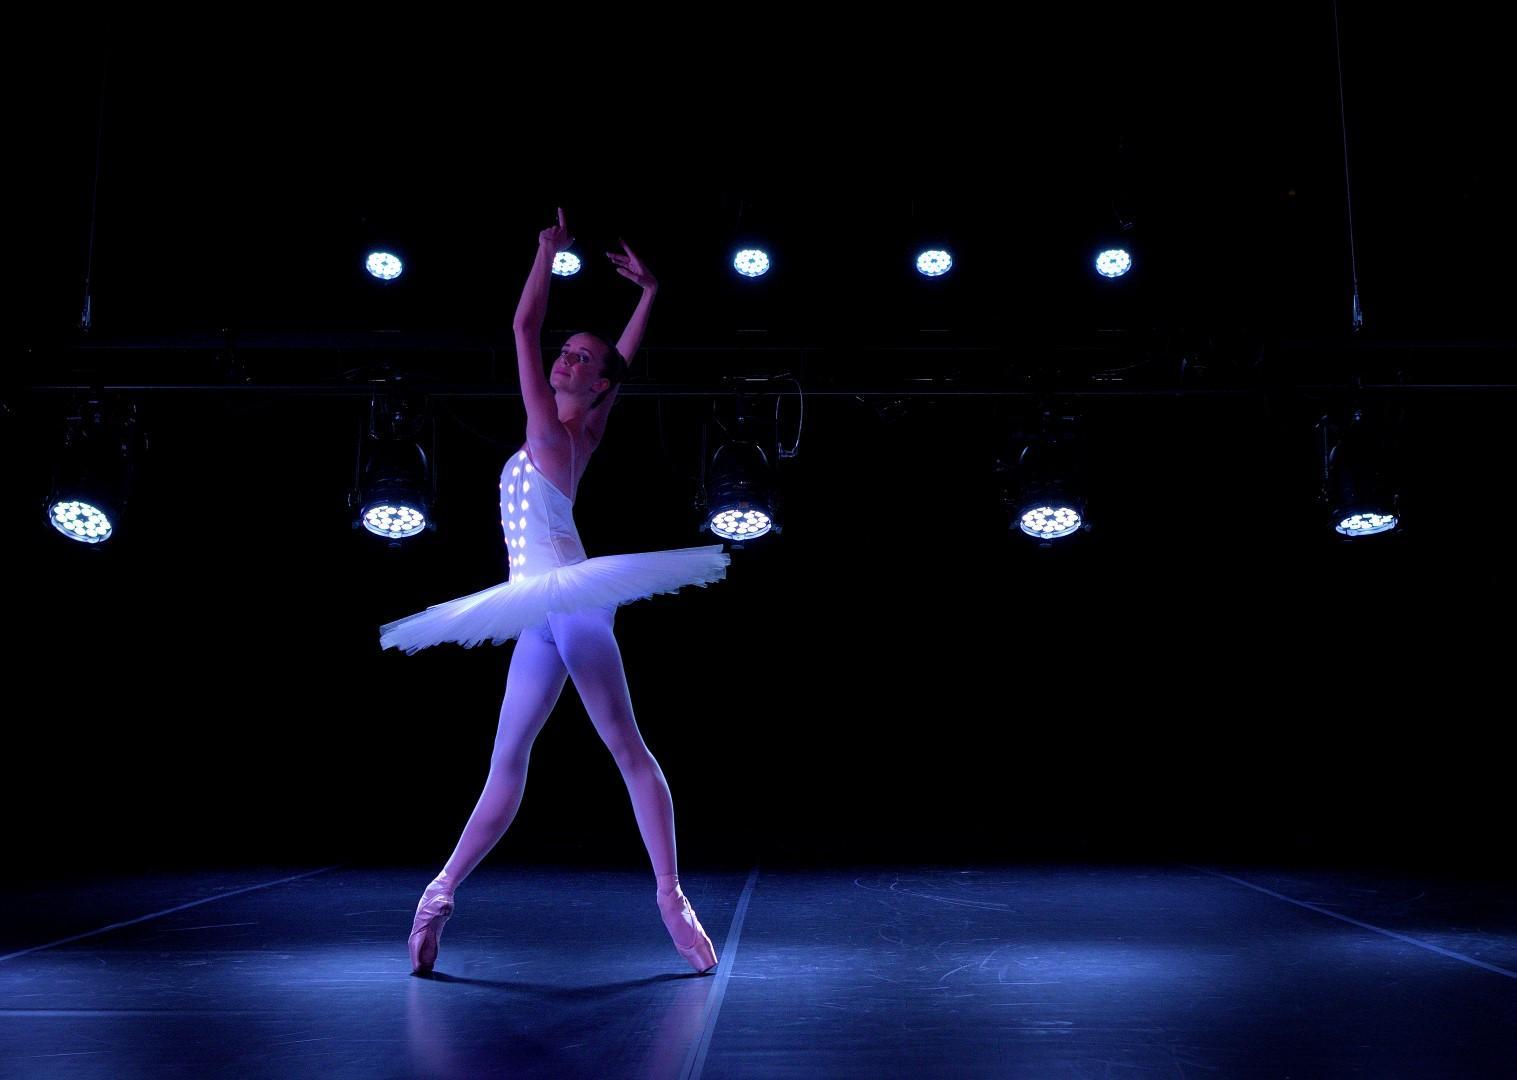 Nikon-D3400-Ballet_2-Large.jpg